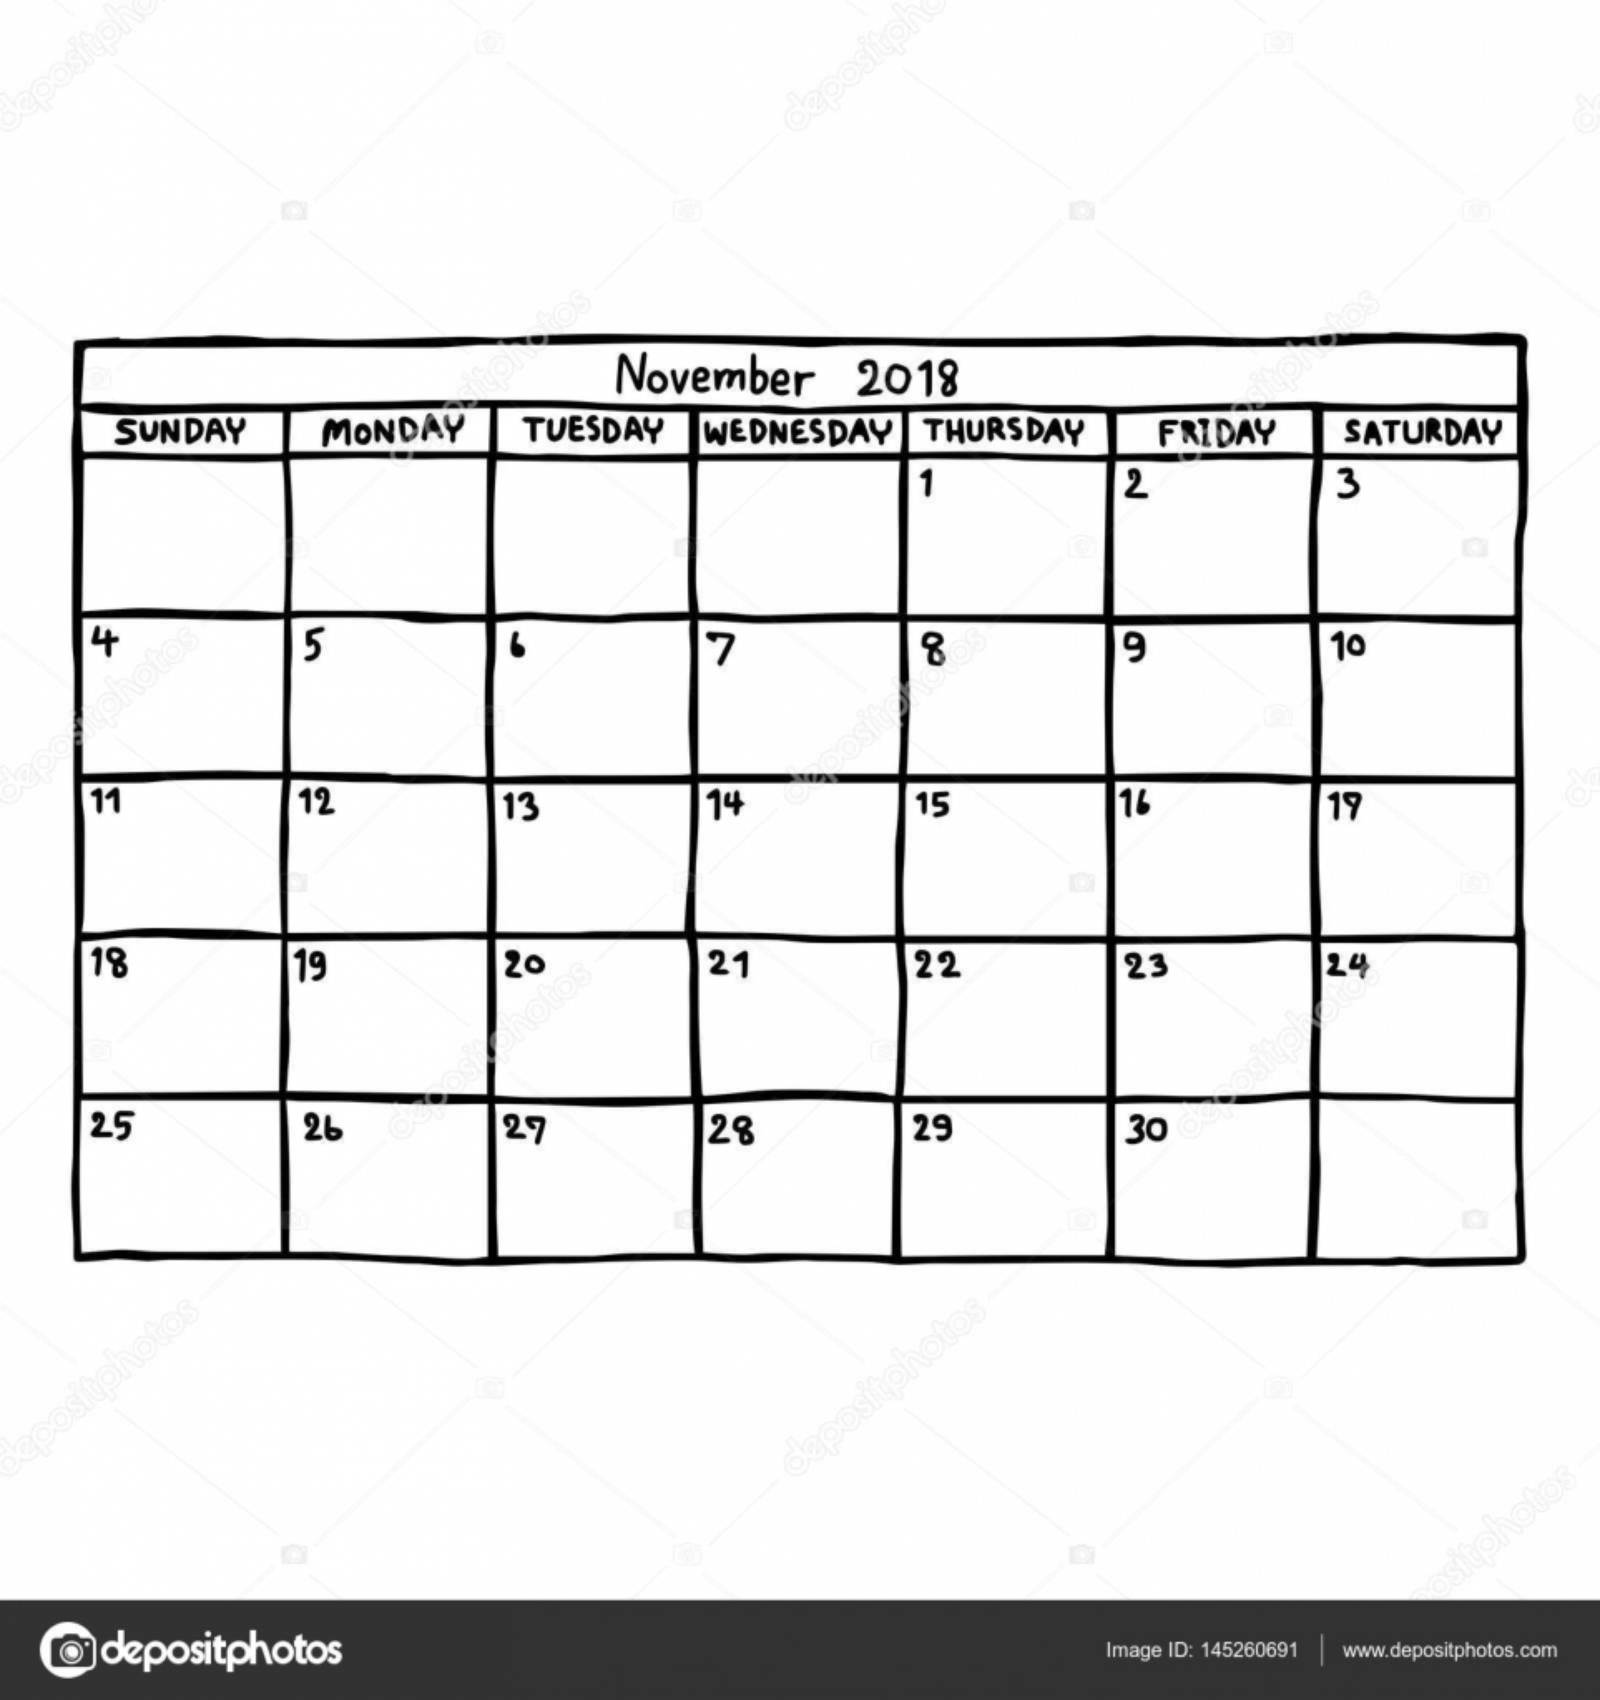 Kalender November 2018 - Vektor-Illustration Skizze handgezeichnete ...